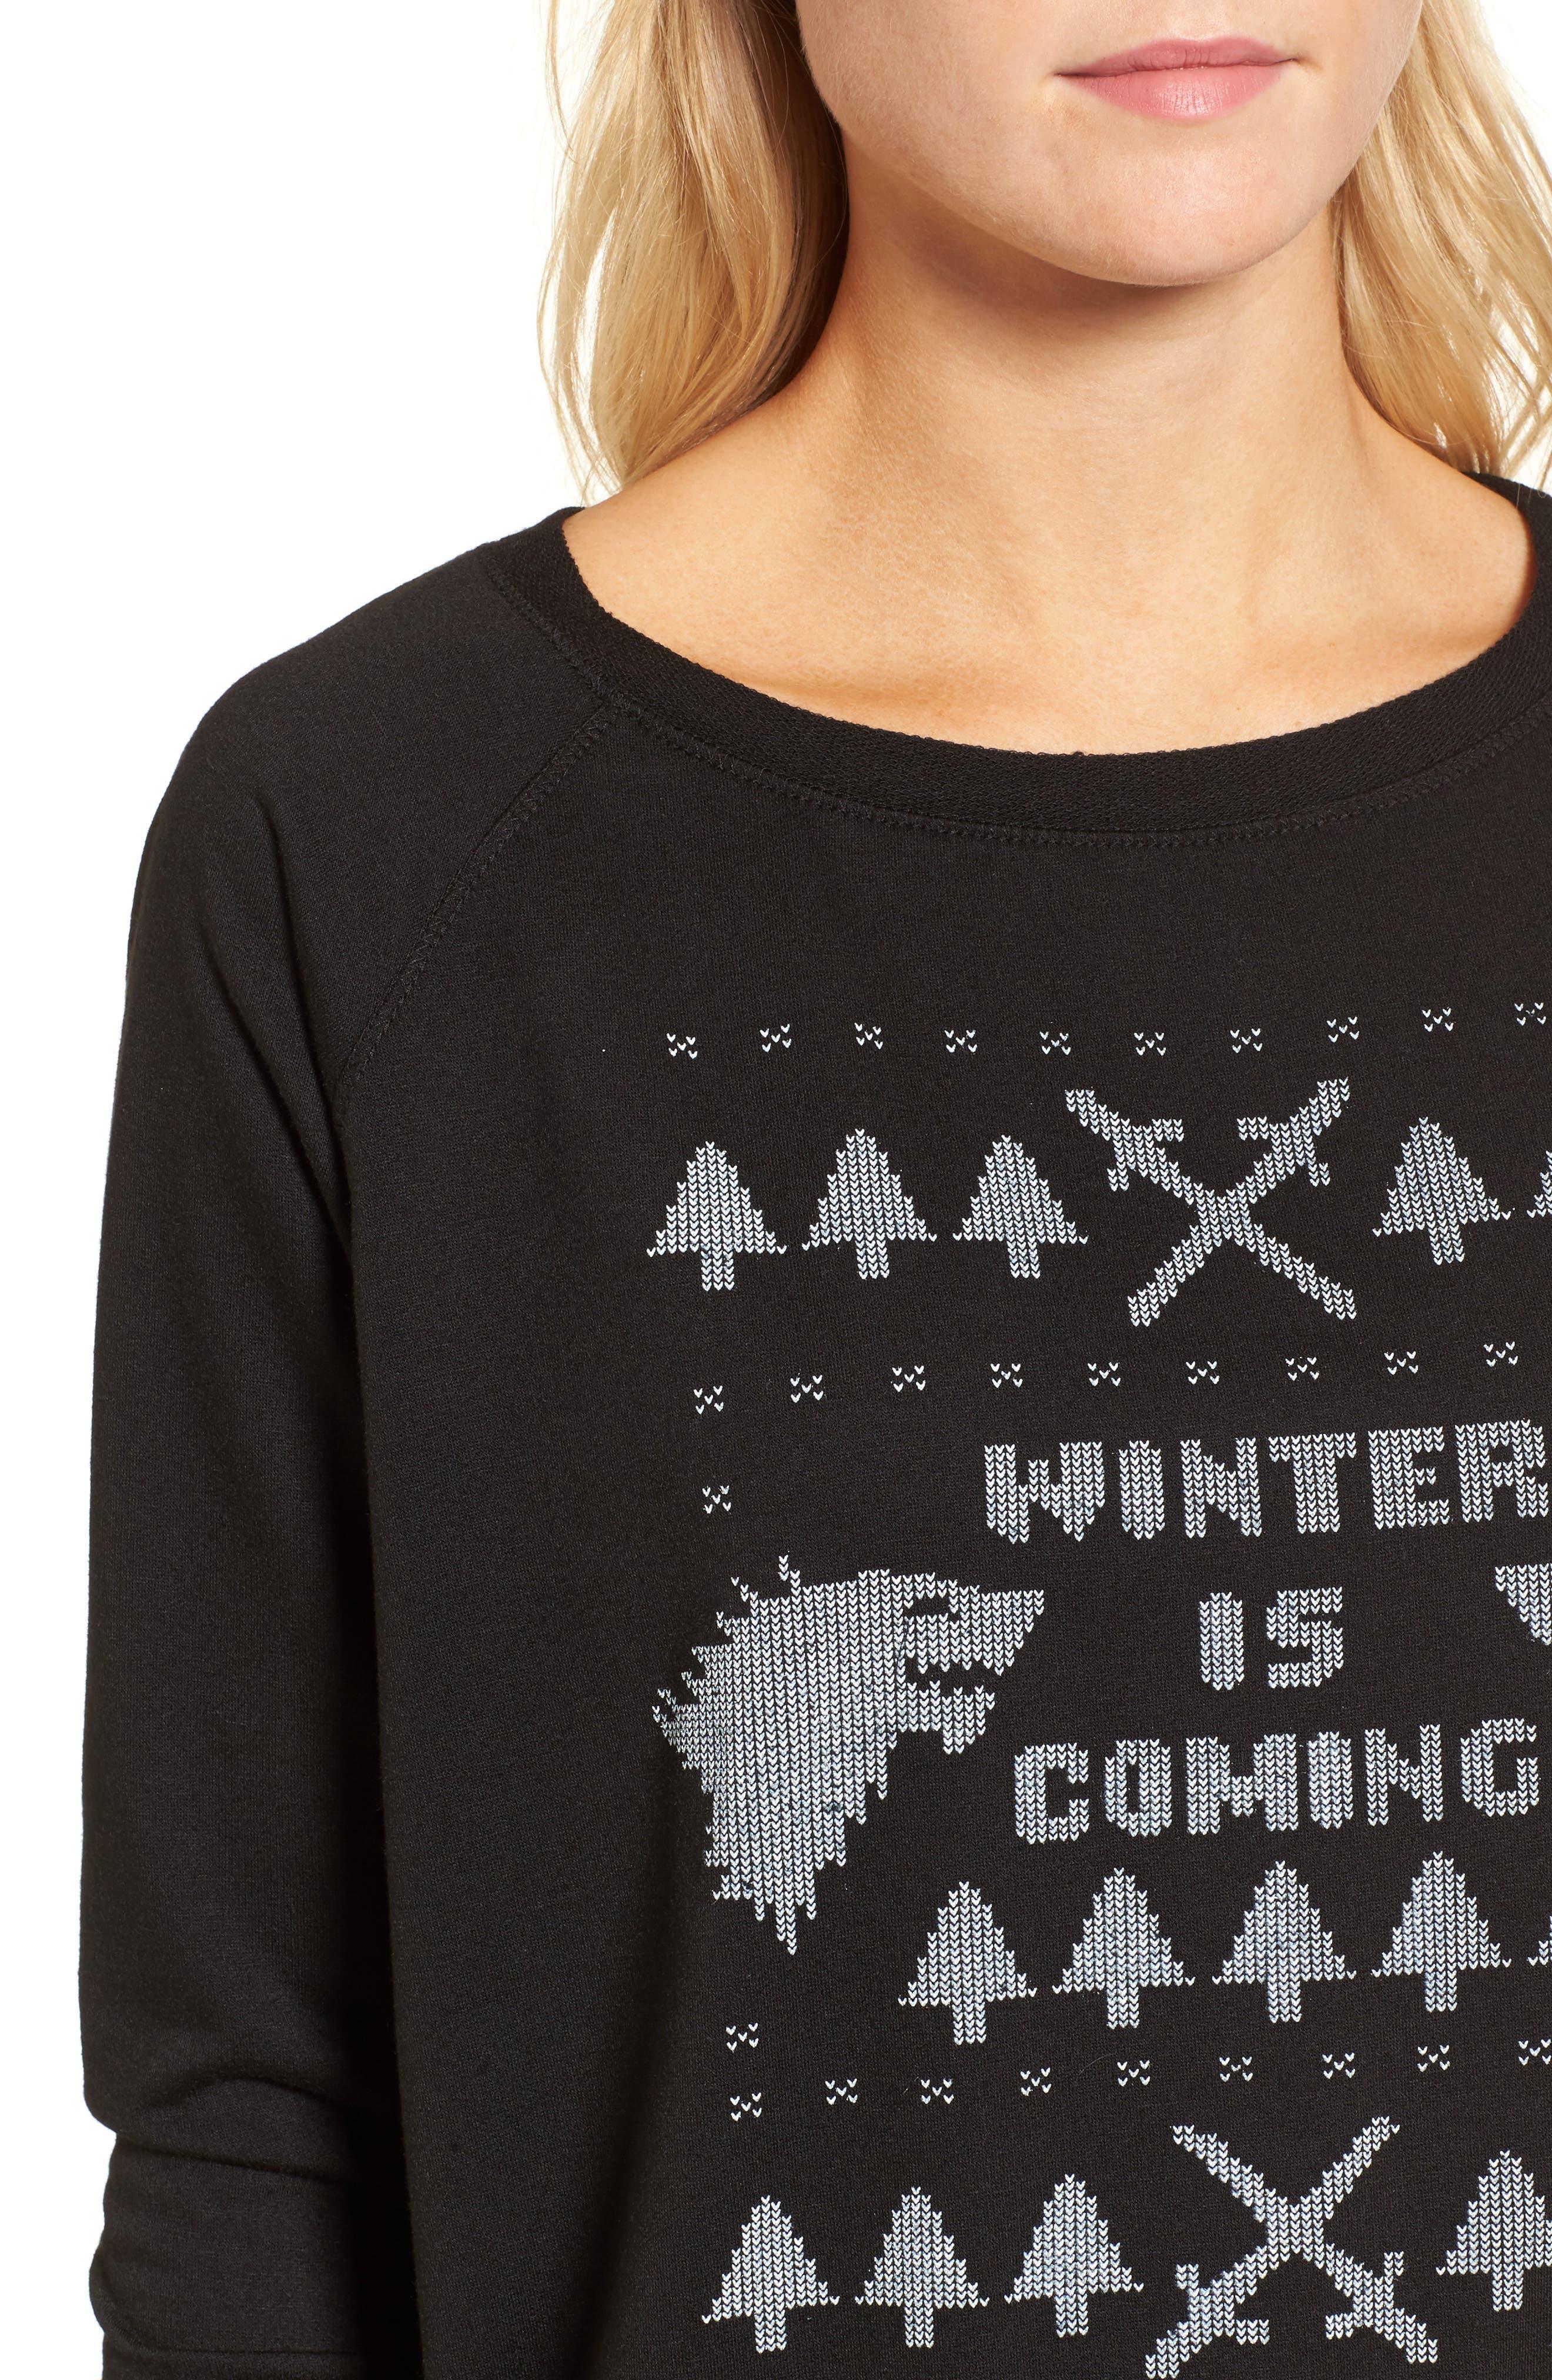 Winter Is Coming Sweatshirt,                             Alternate thumbnail 4, color,                             Black